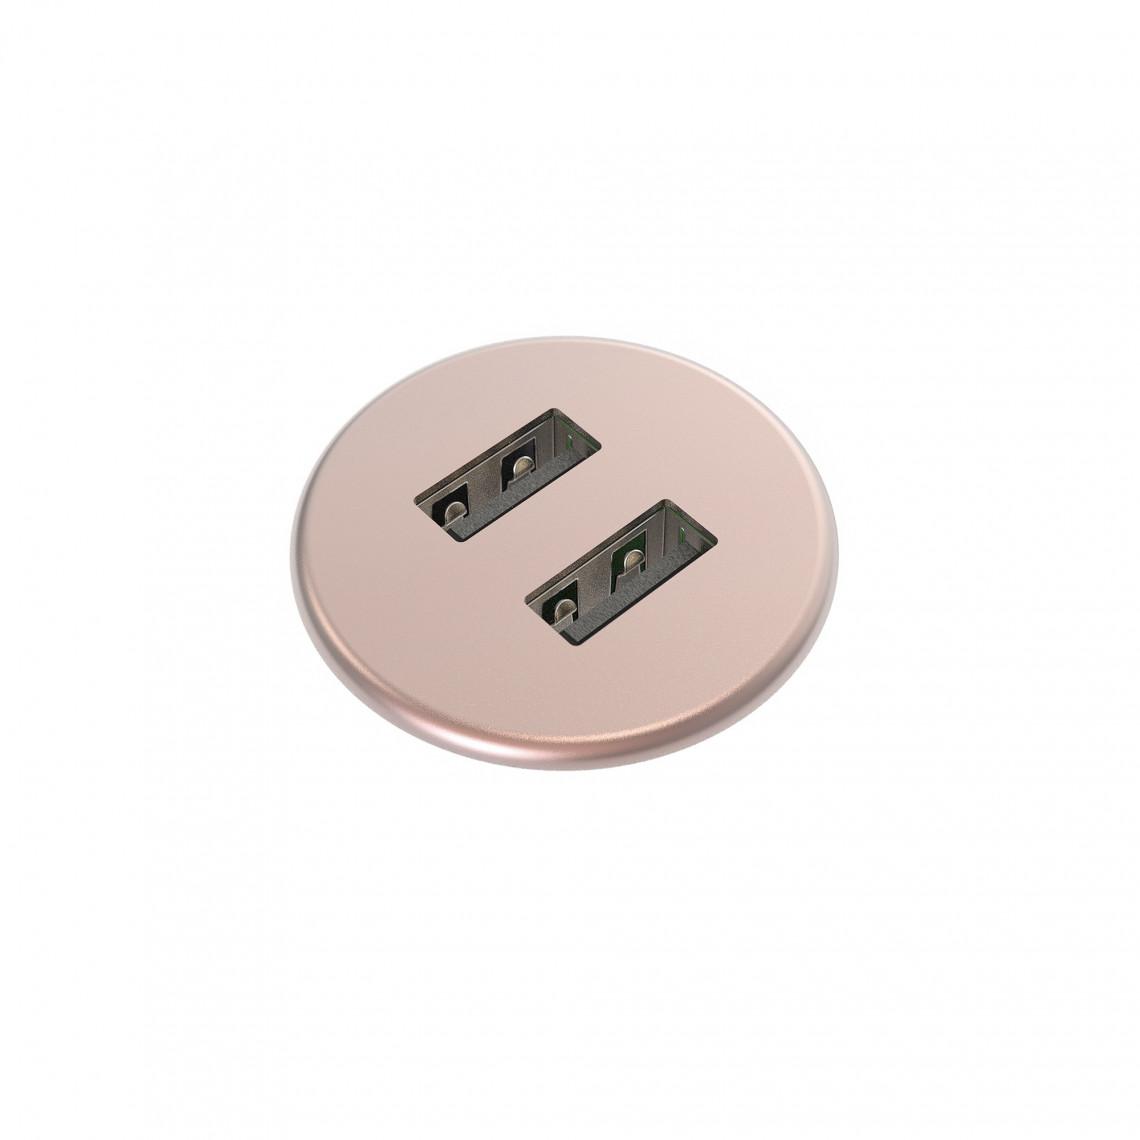 Powerdot MICRO - USB Laddare 2 portar 5V 2A - metall